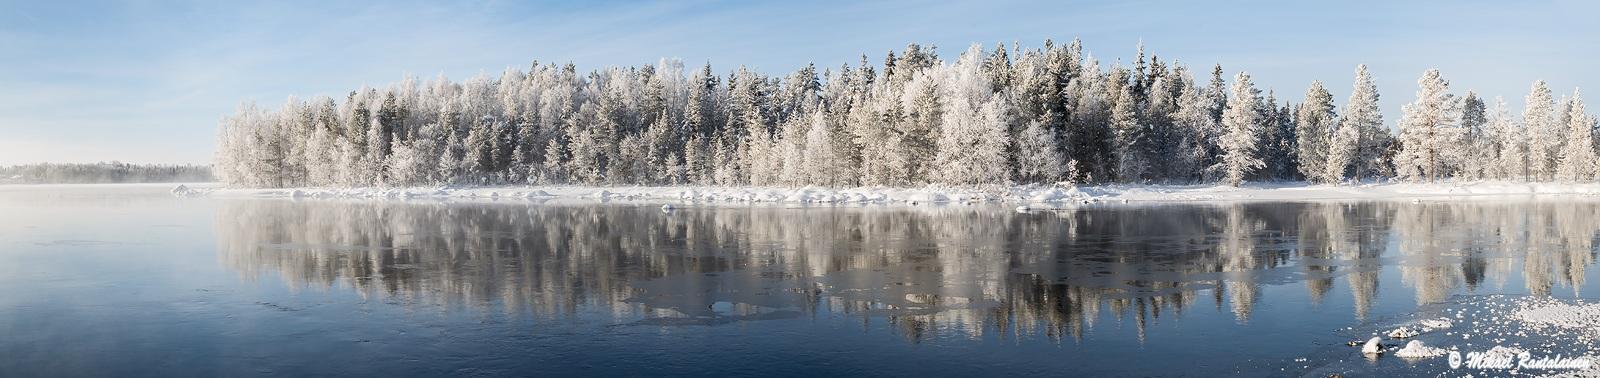 Kiveskoski, Kuusamo